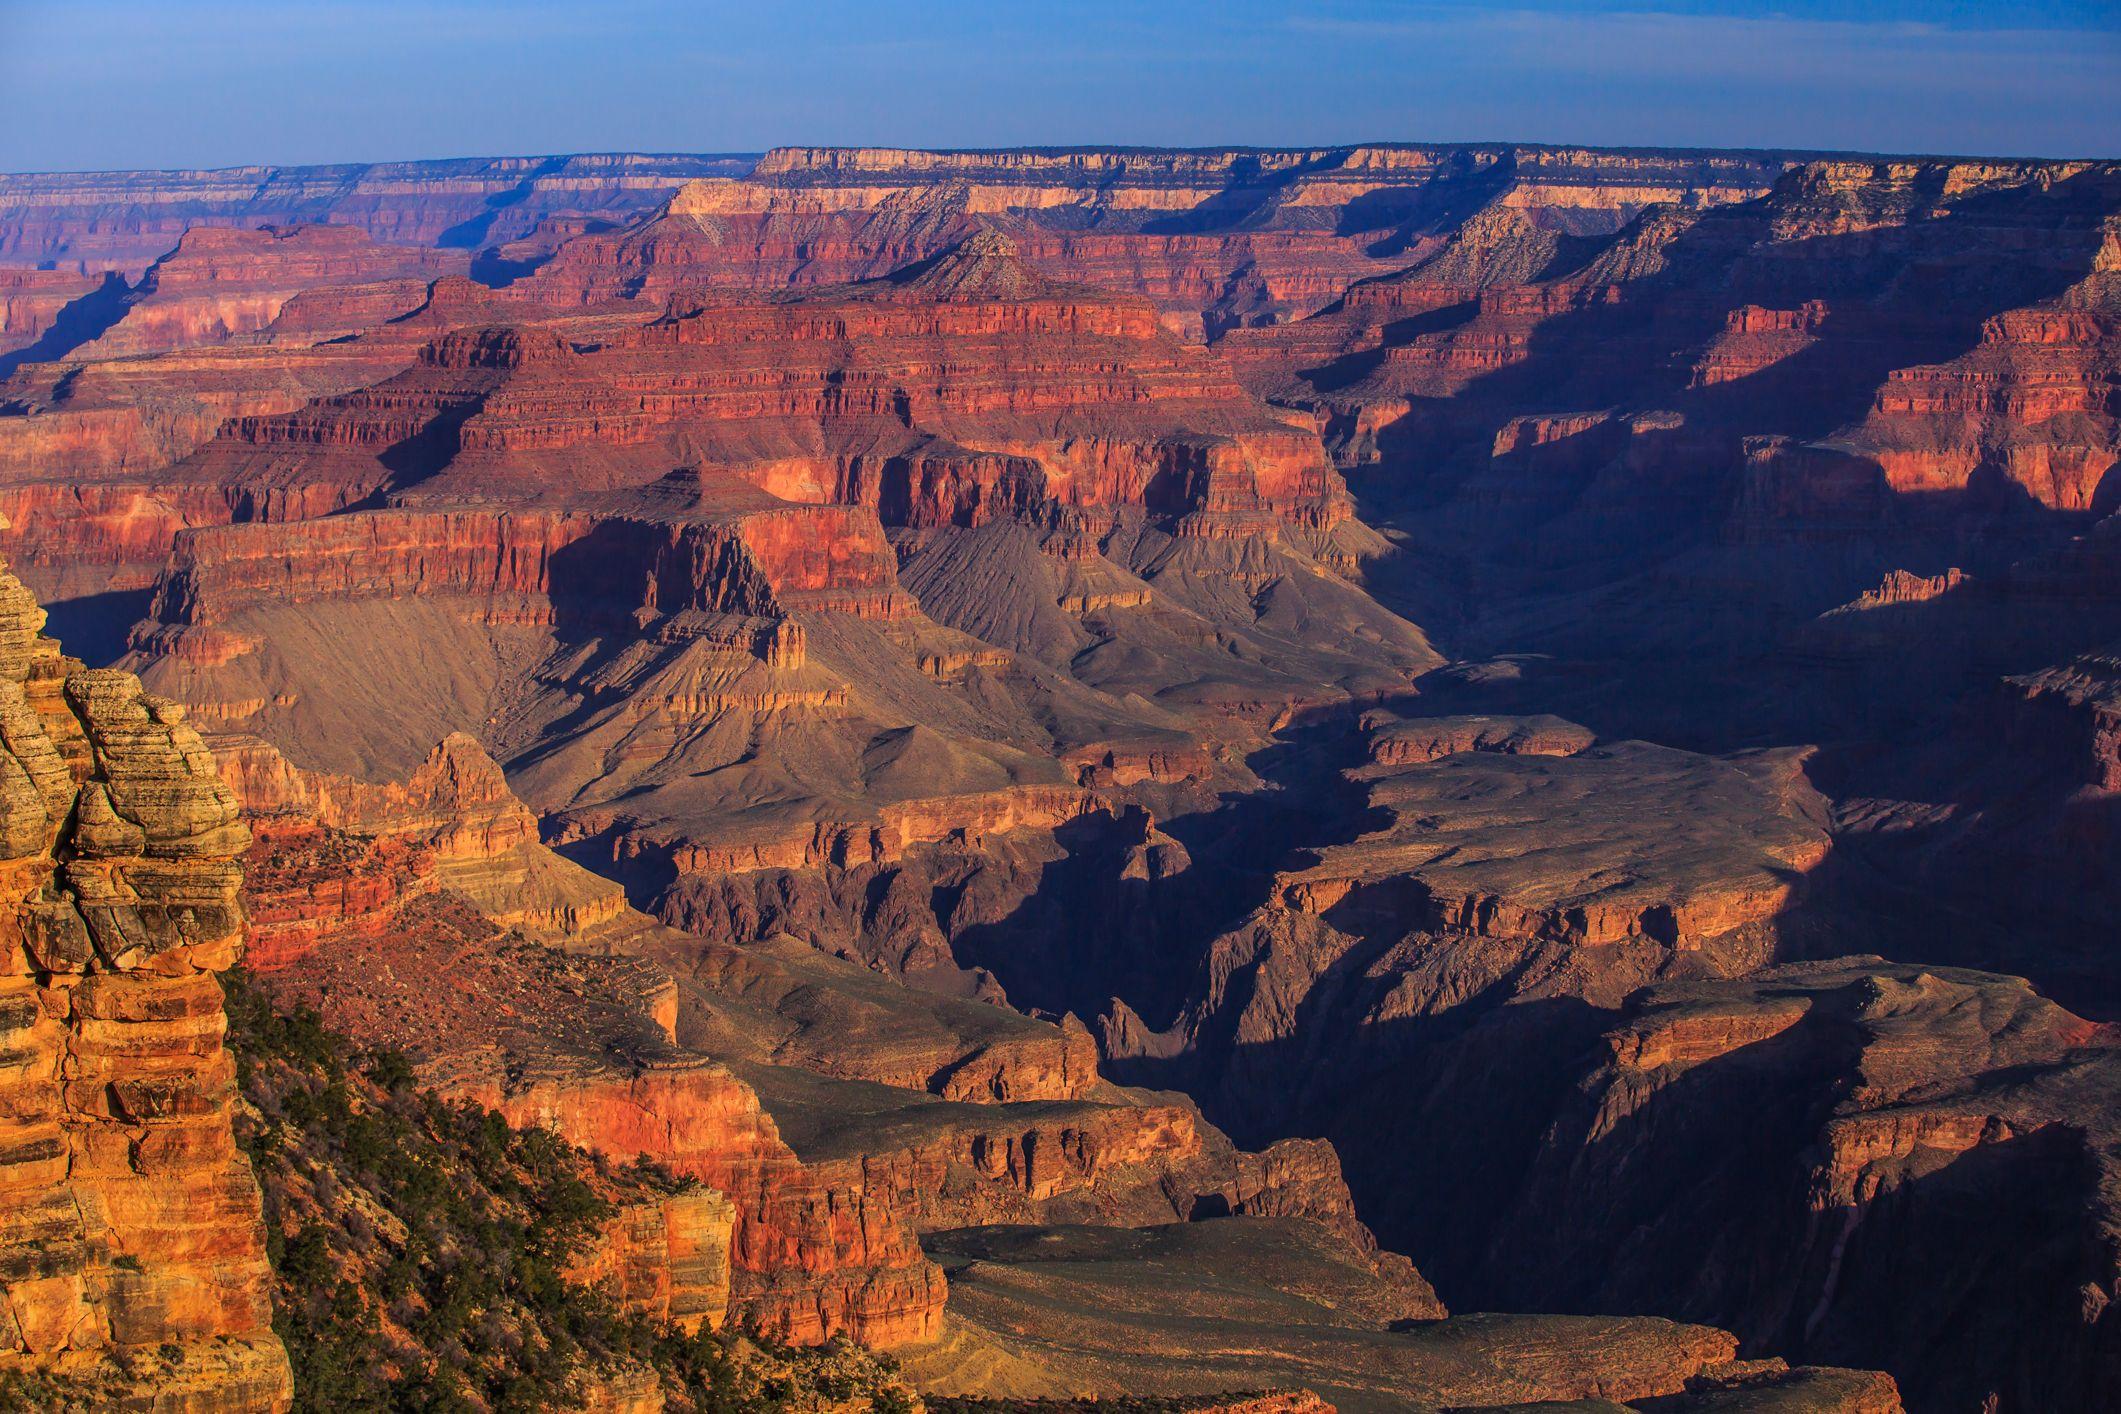 Grand Canyon South Rim Tour Bus With Walking Tour Guide